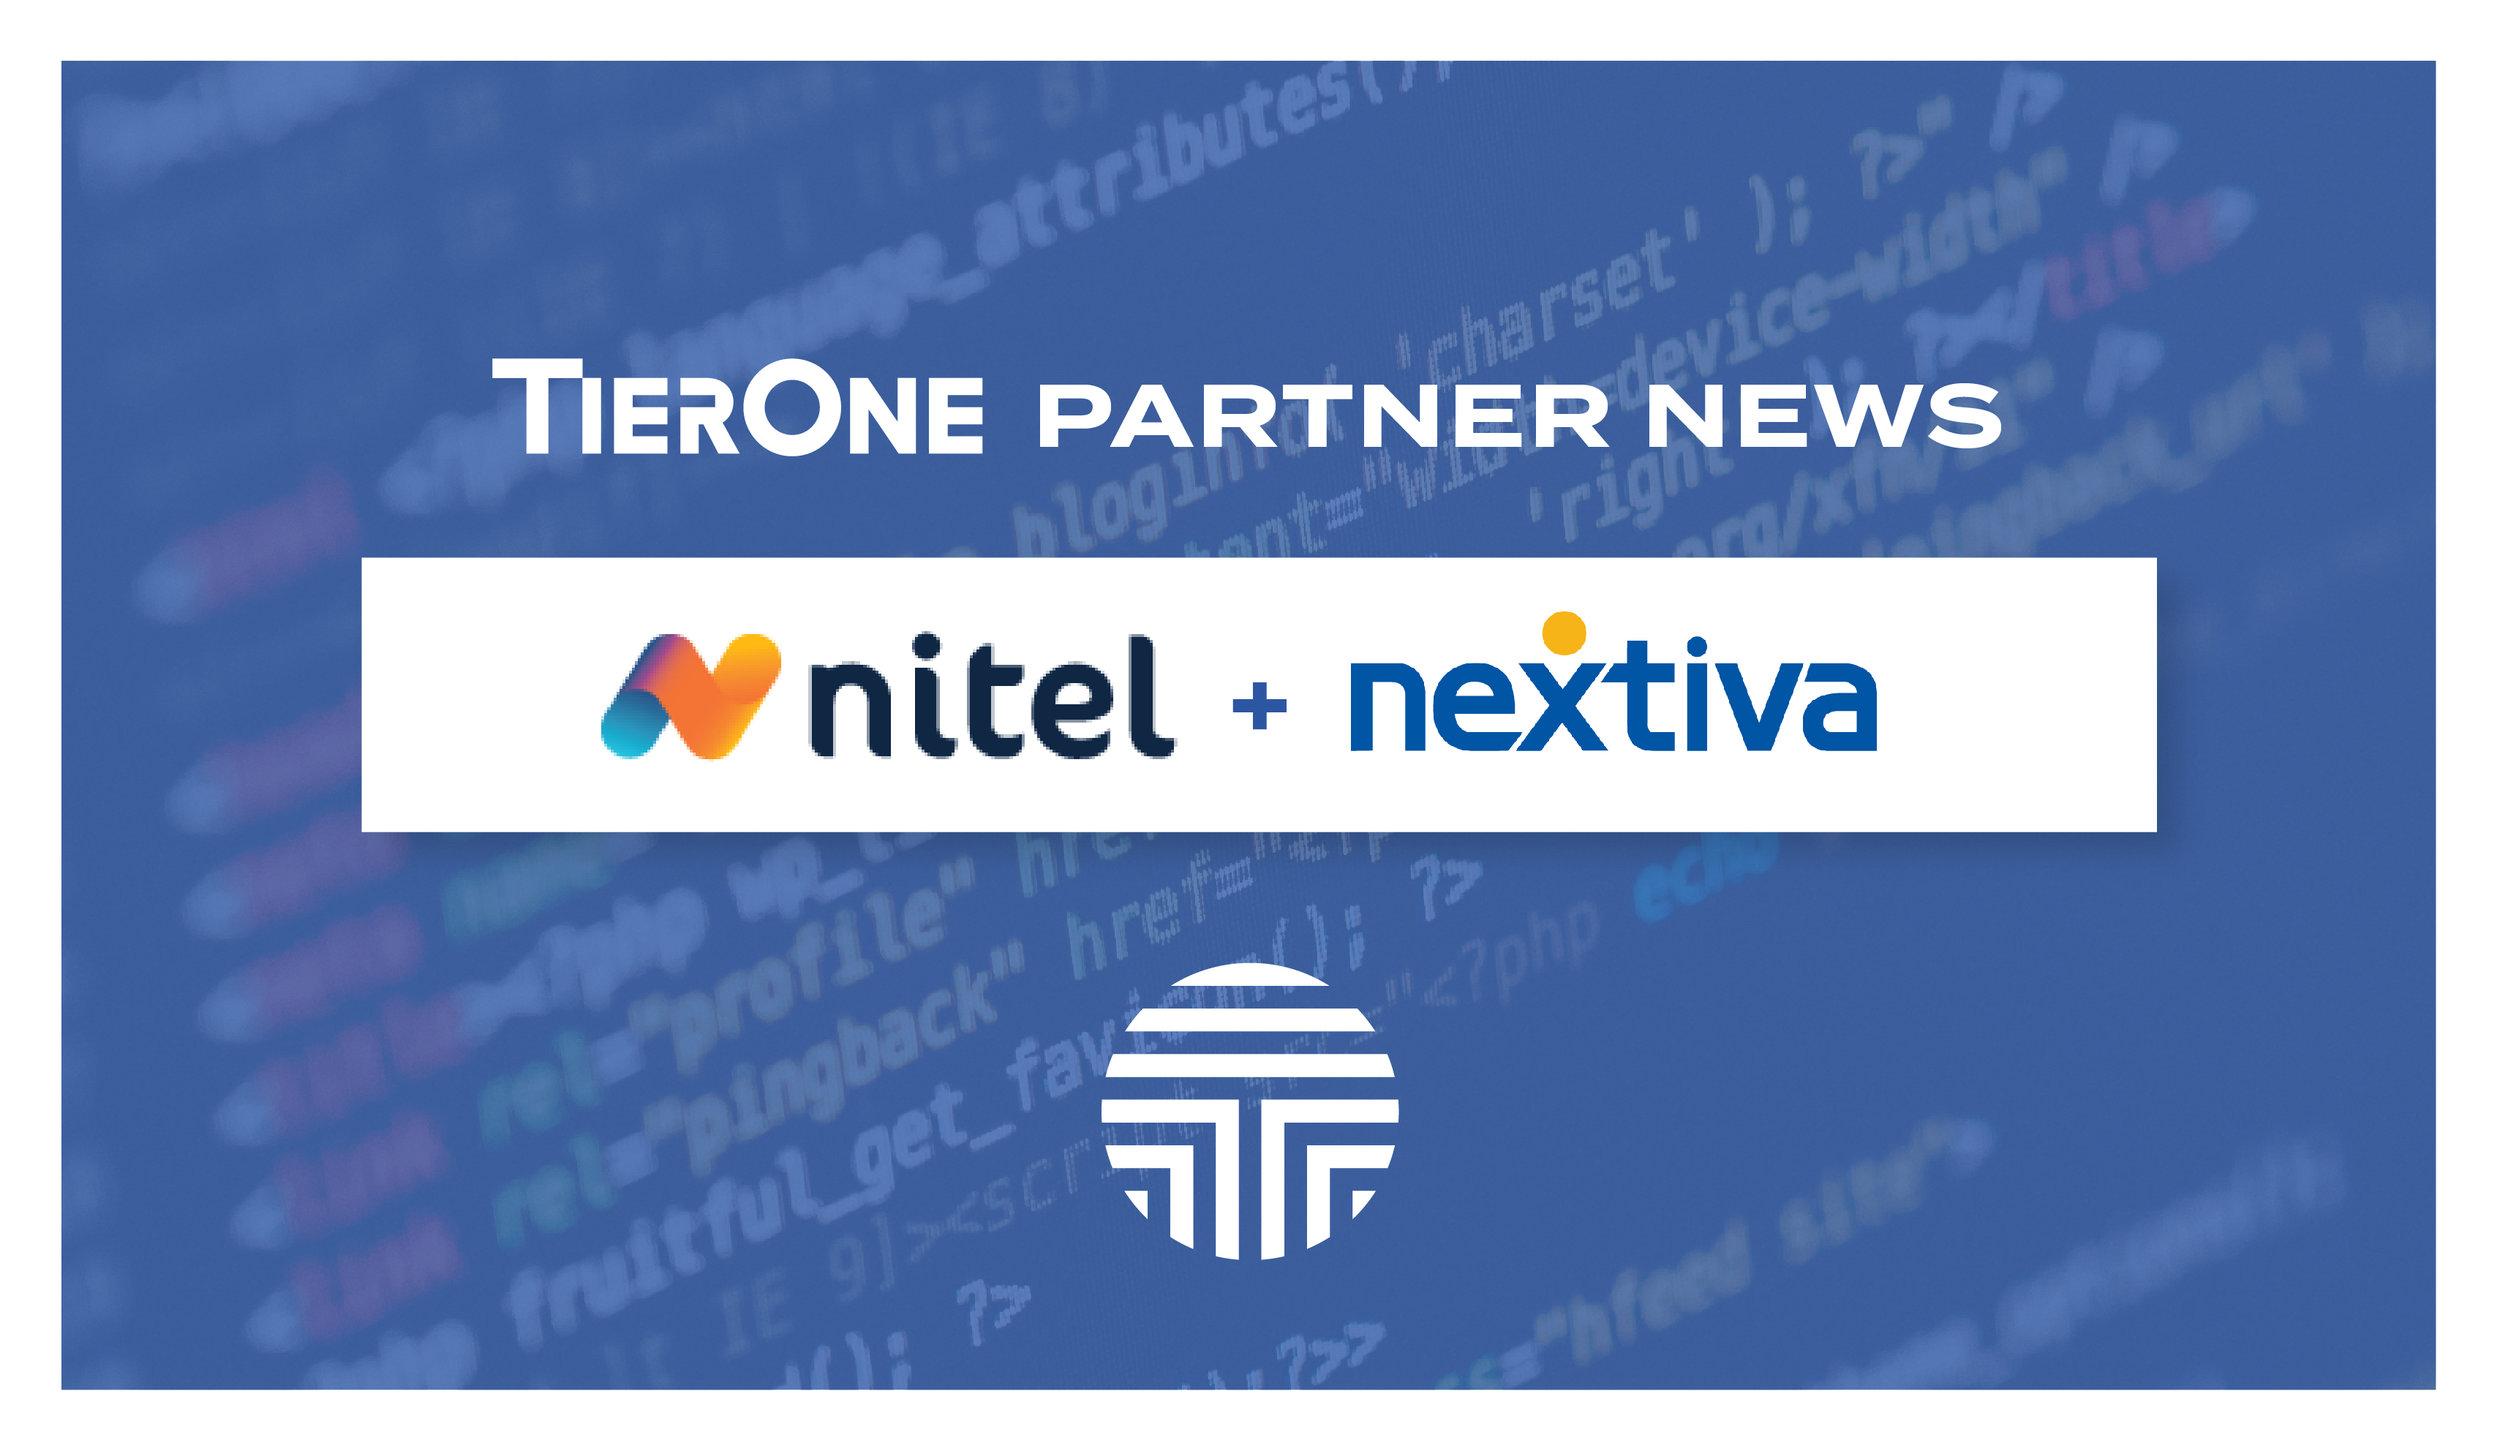 TierOne-Nitel-Nextiva-2.jpg